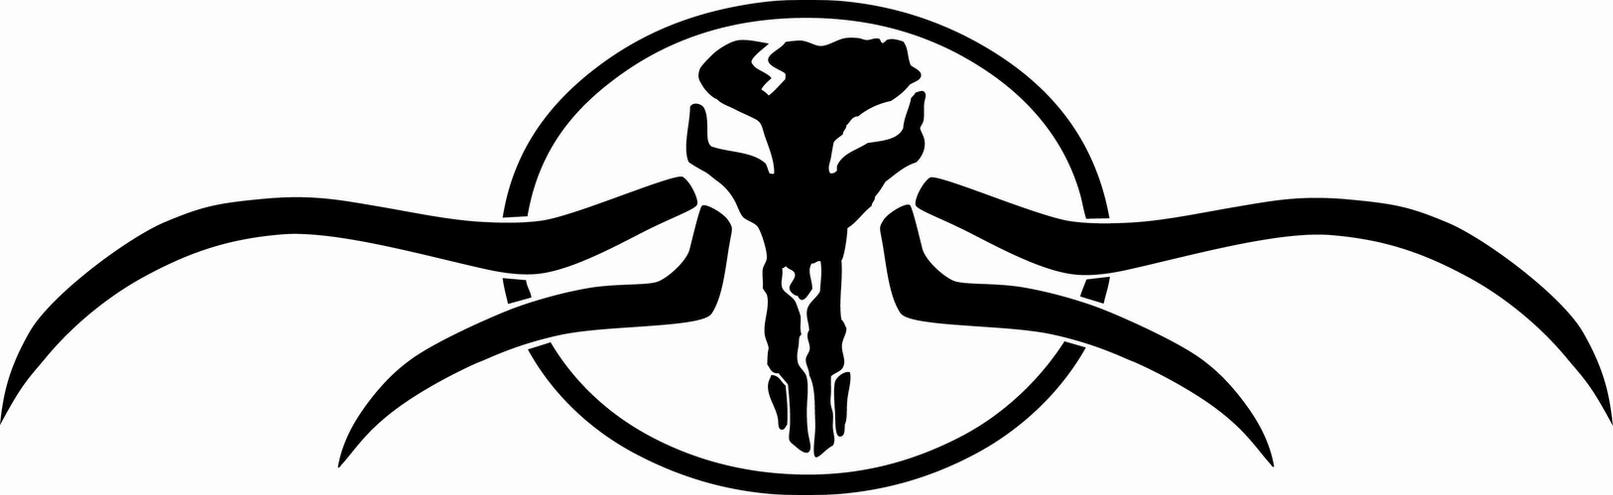 Mythosaur Tattoo